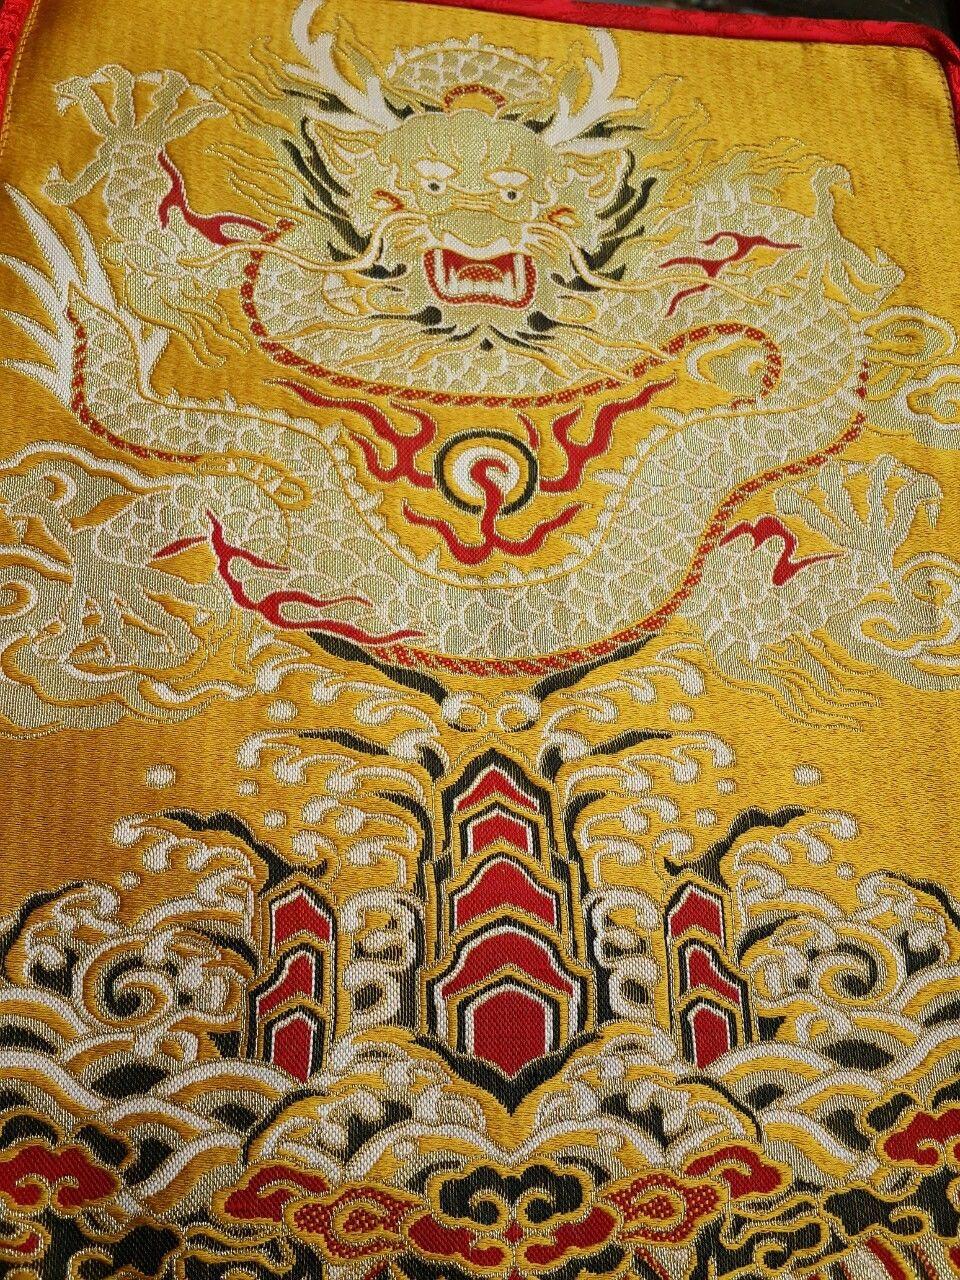 p 6416 yellow dragon